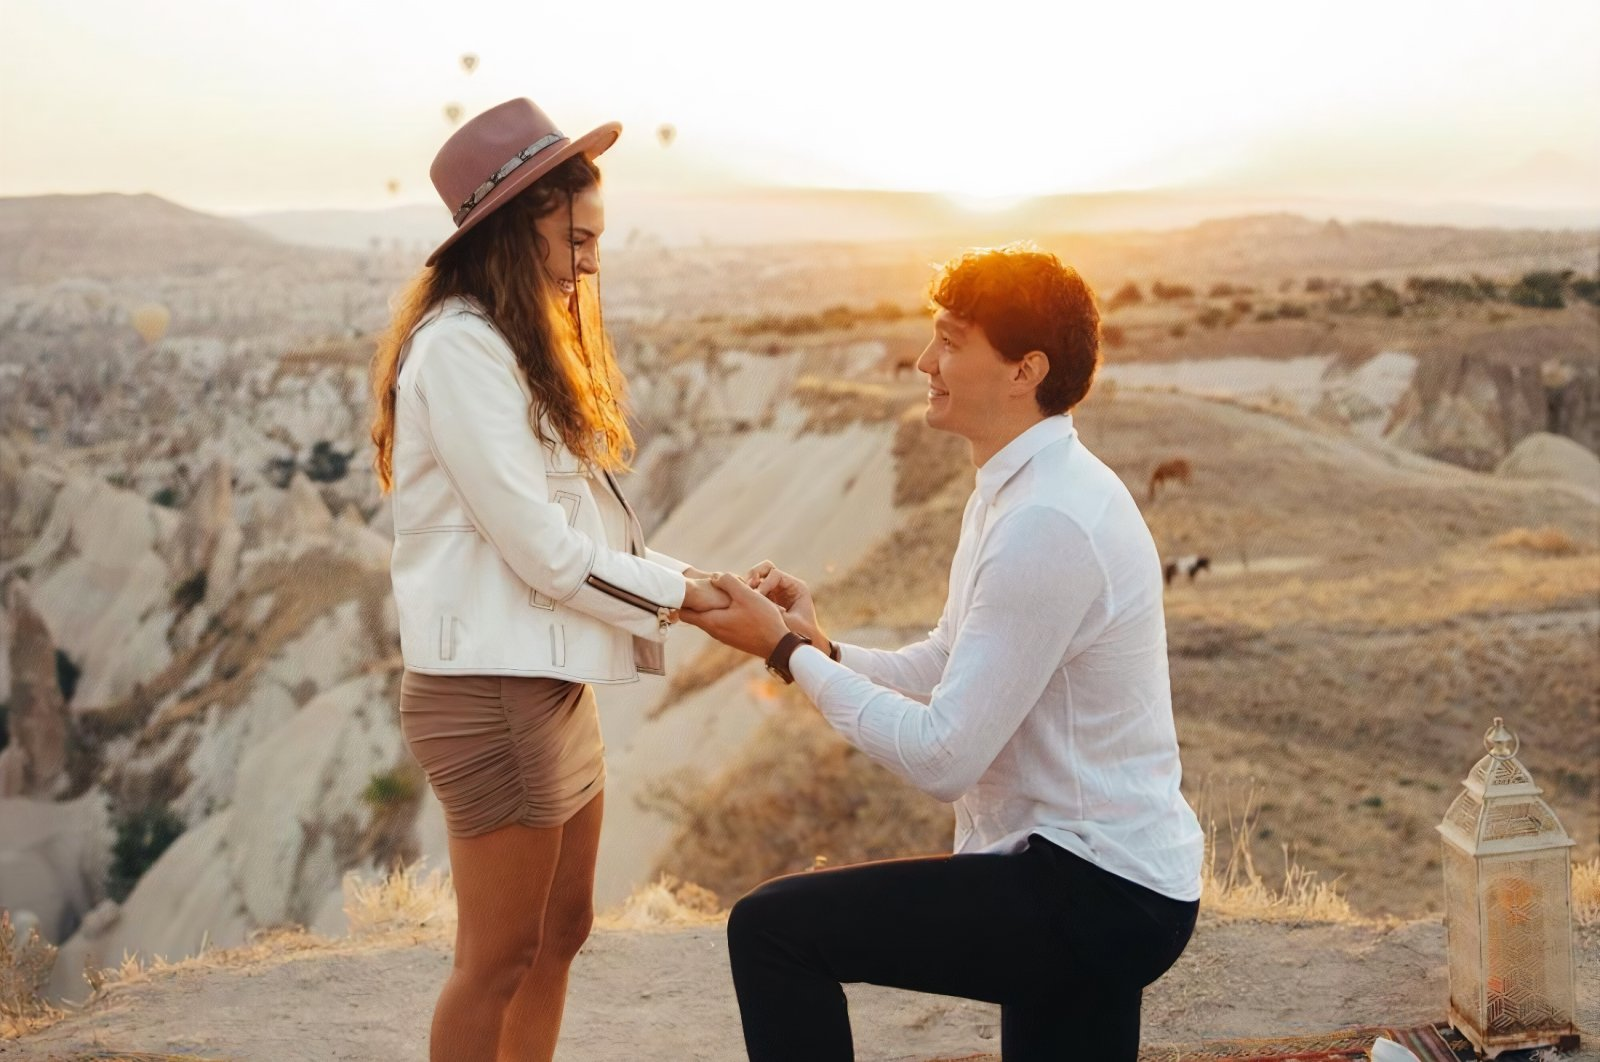 Turkish NBA star Cedi Osman (R) proposes to his long-time girlfriend Ebru Şahin in Cappadocia, Nevşehir, central Turkey, Sept. 14, 2021. (Photos: Cedi Osman on Instagram)